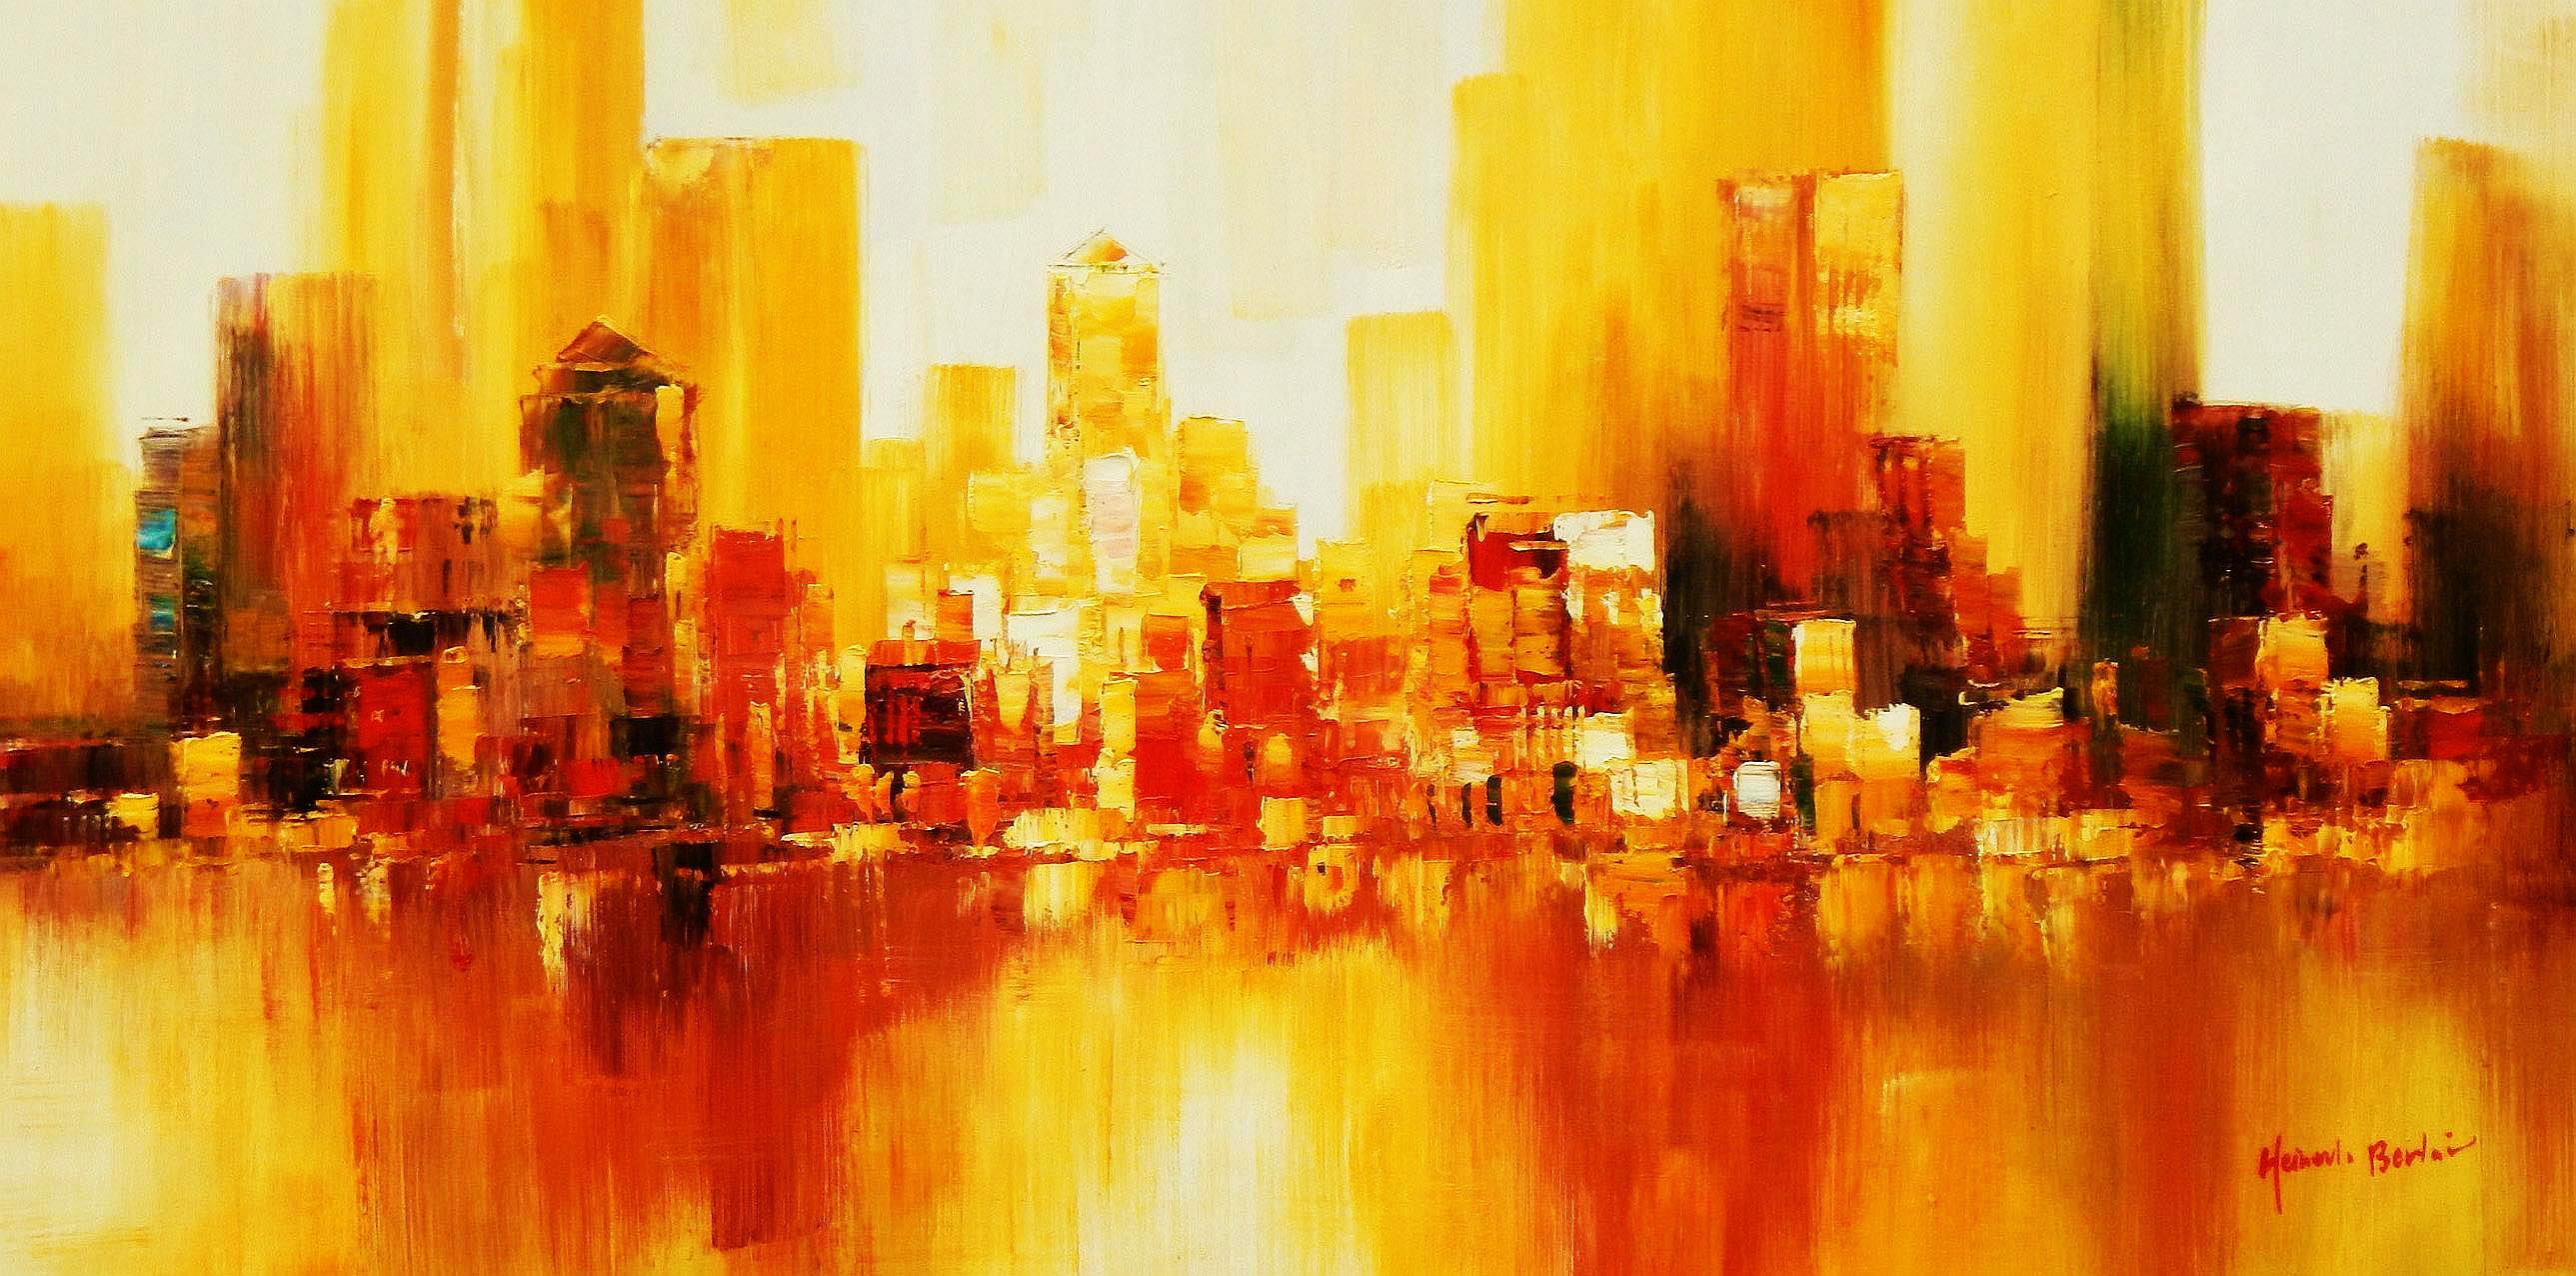 Abstrakt New York Manhattan Skyline im Herbst f94314 60x120cm abstraktes Ölbild